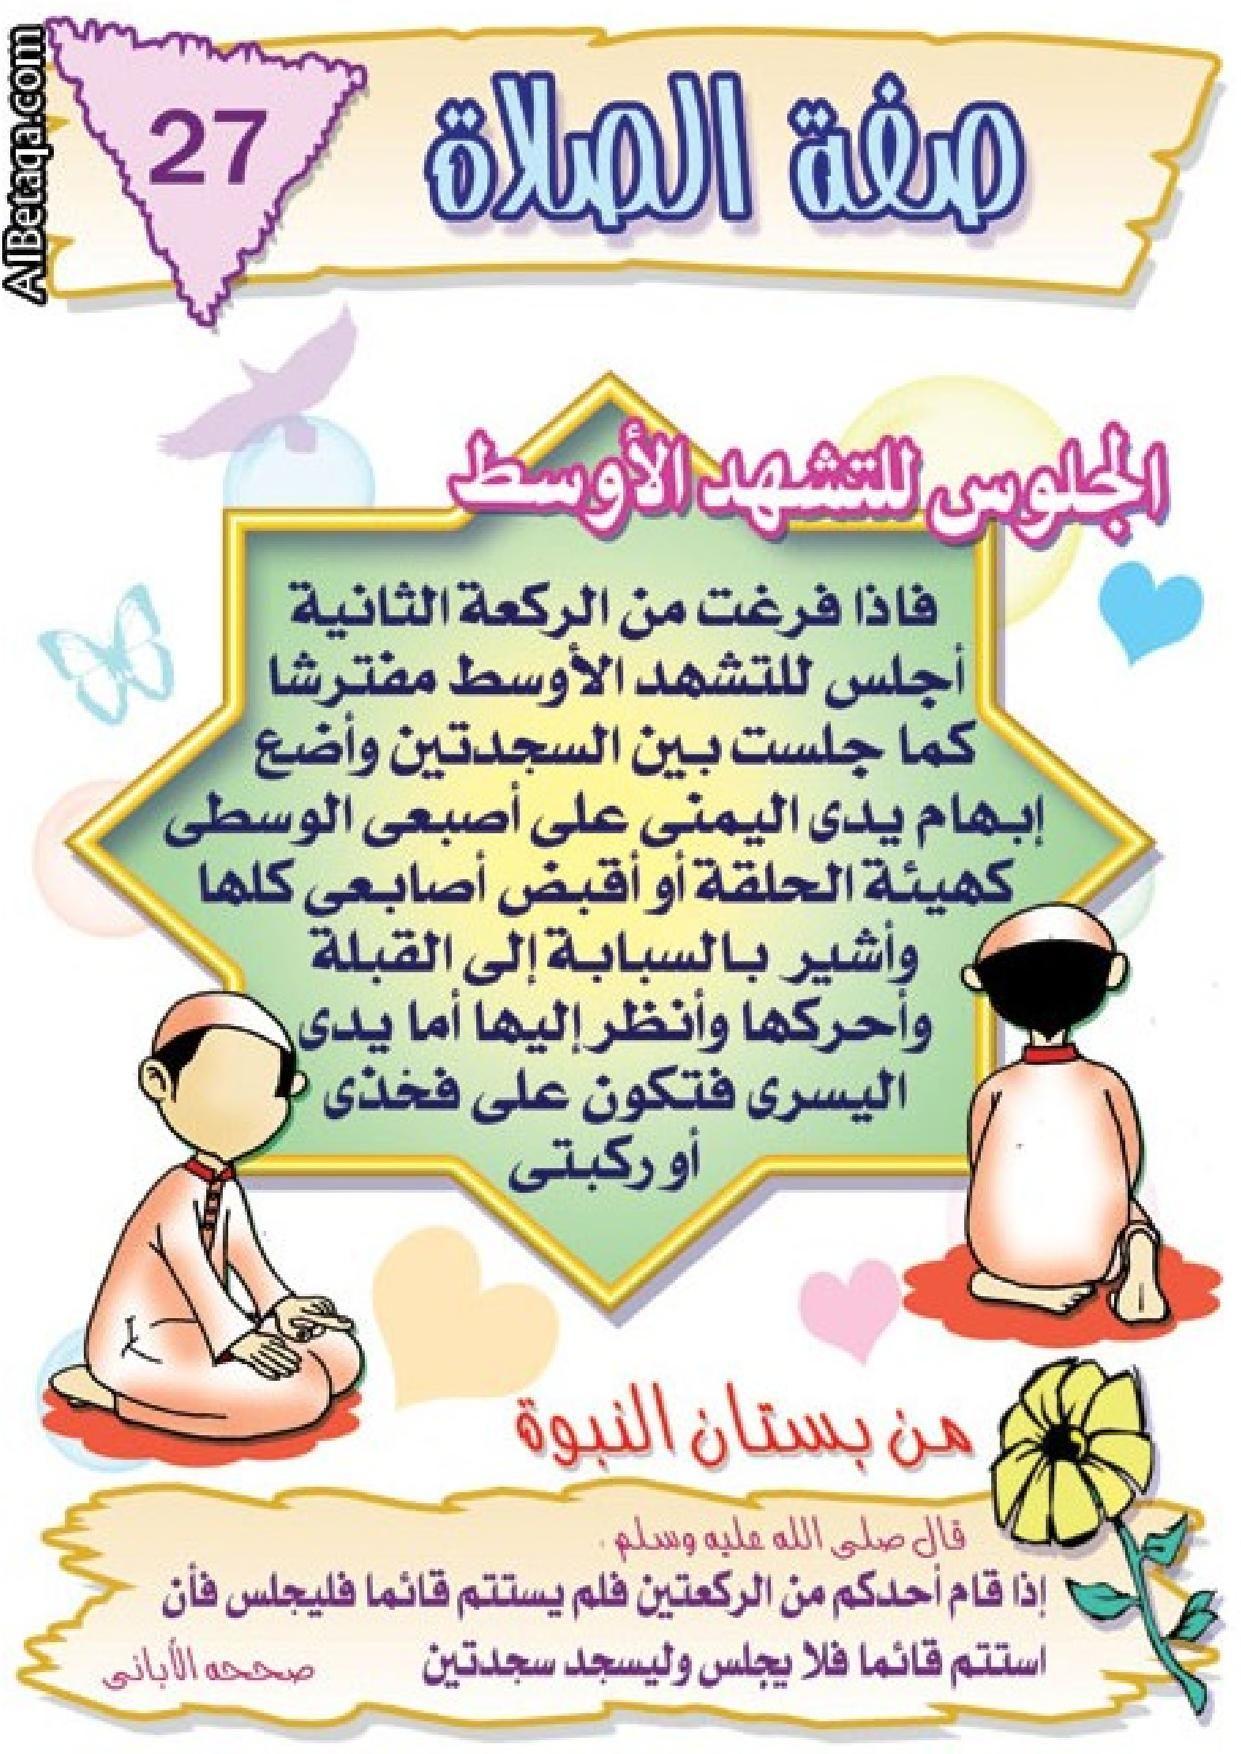 0197 كتاب صيغة مصورة اقرا اونلاين أحكام الصلاة Free Download Borrow And Streaming Internet Archive Learn Islam Islam Beliefs Islam For Kids